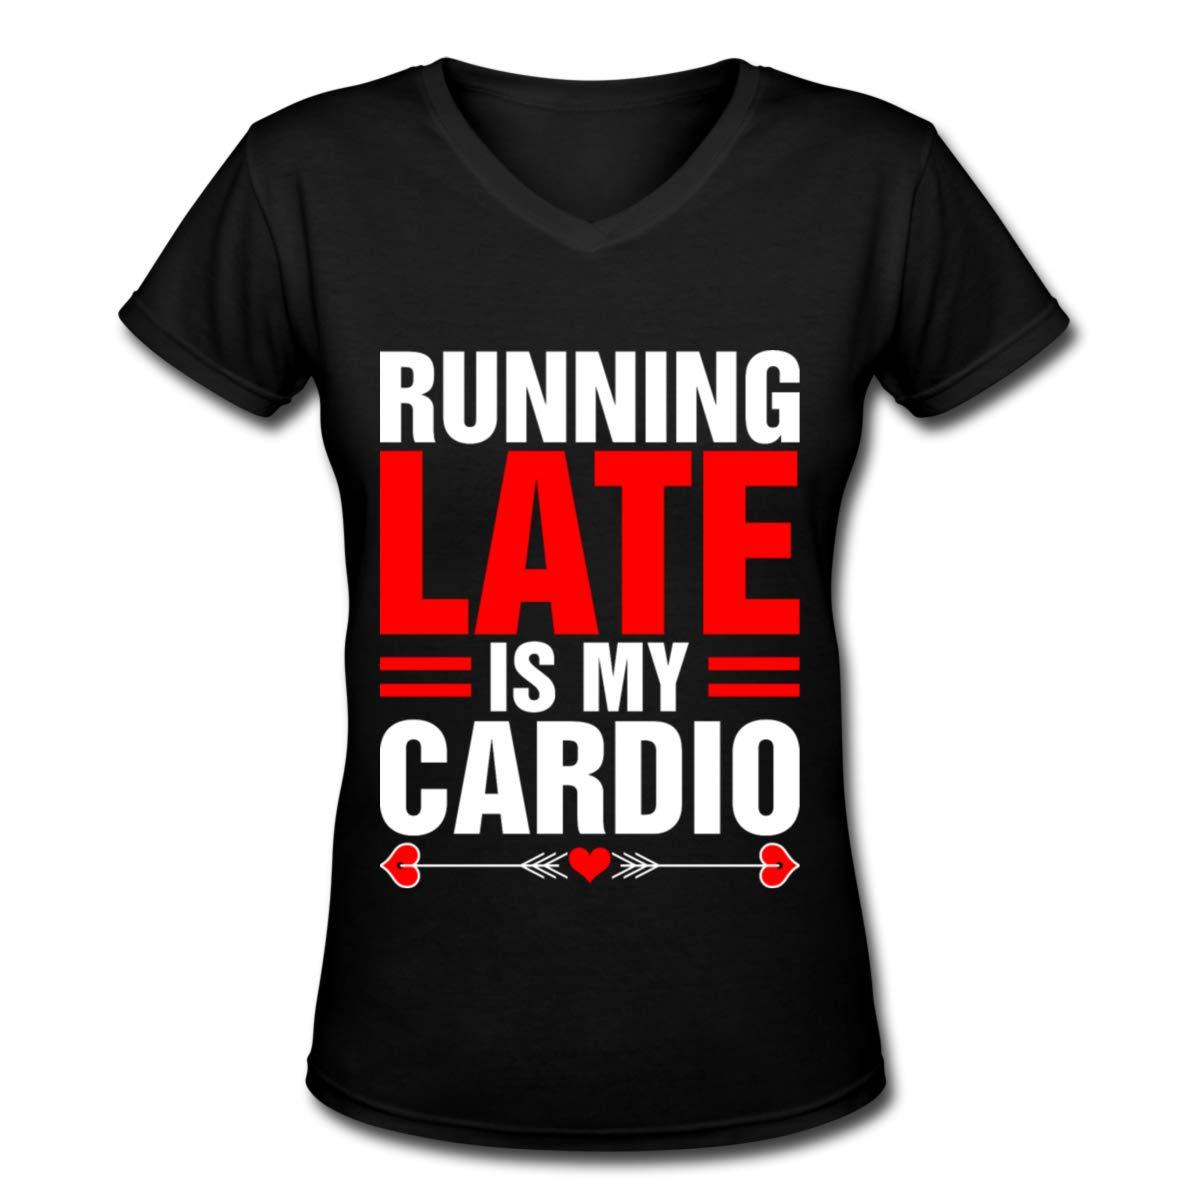 FOECBIR Running Late is My Cardio Womens V-Neck Short Sleeve Tshirt